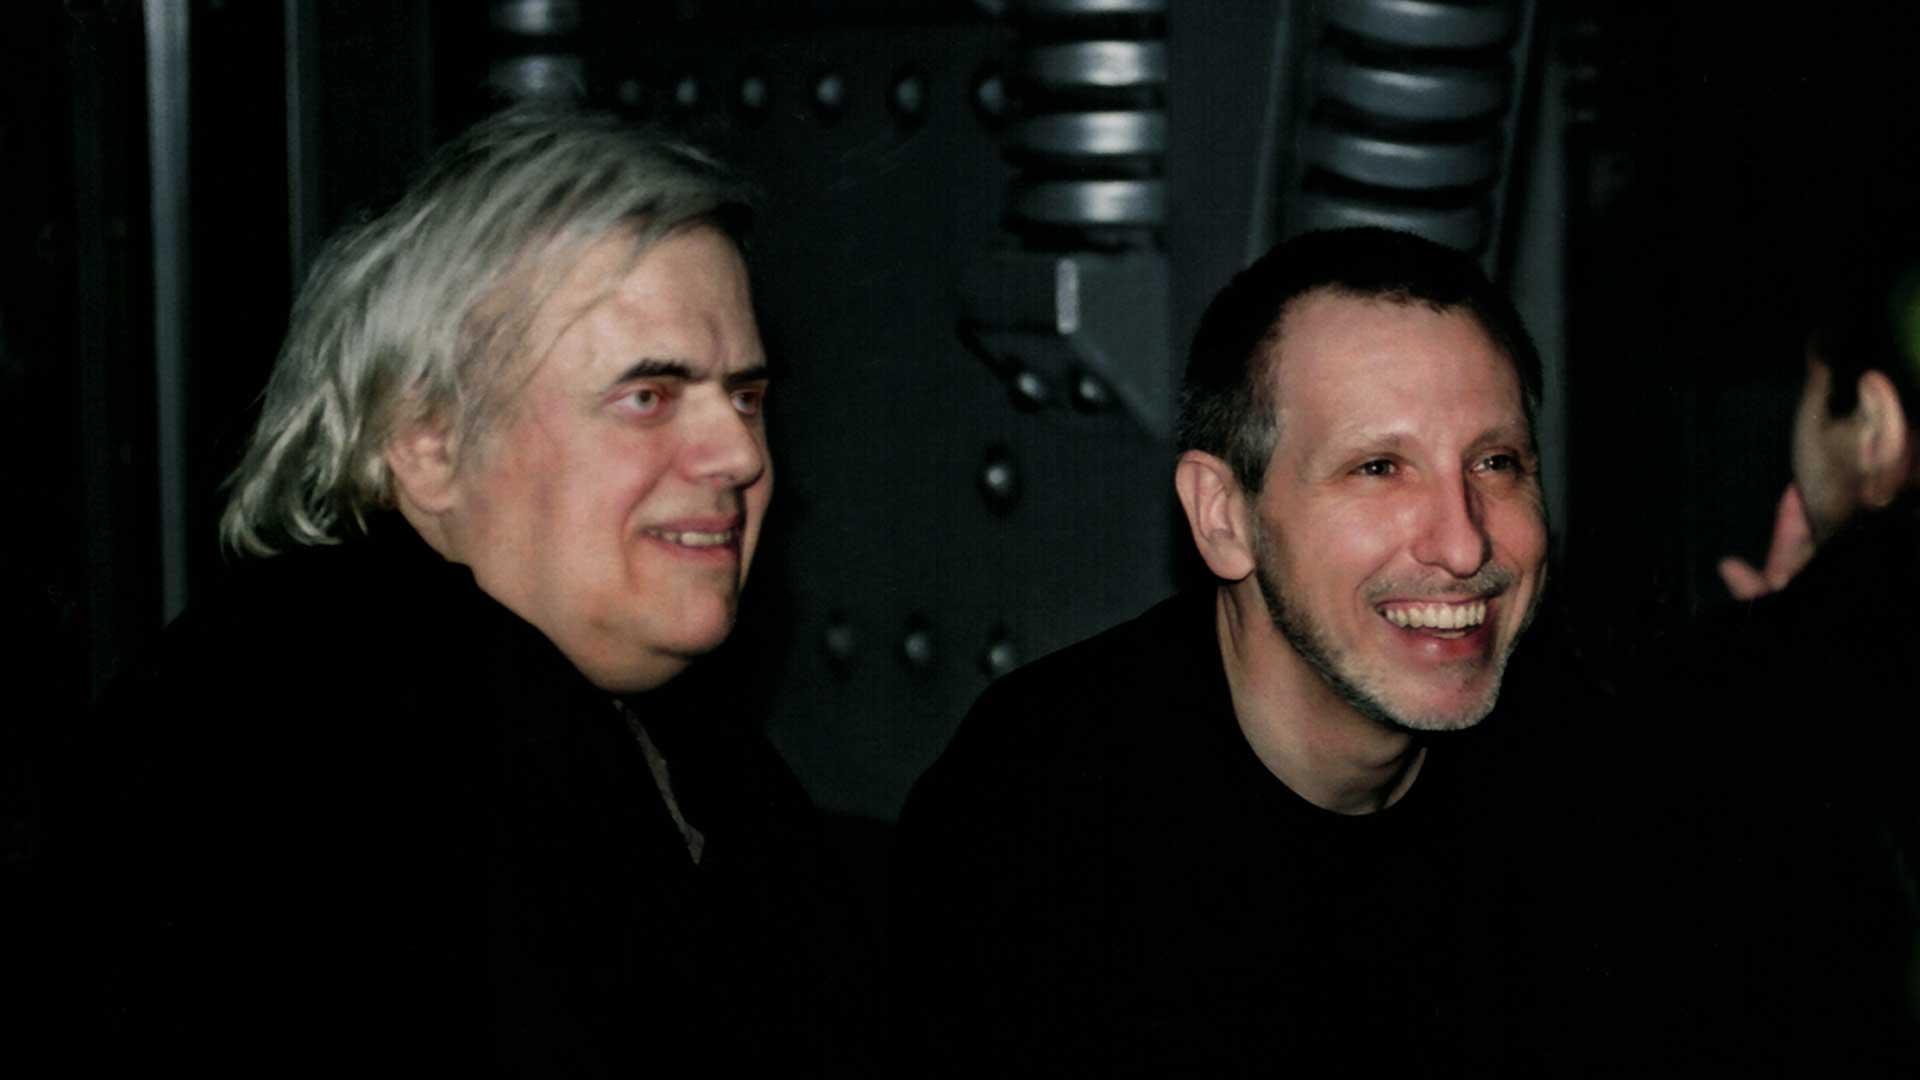 Alien-Schöpfer Hansruedi H.R. Giger mit Gregor Spörri.